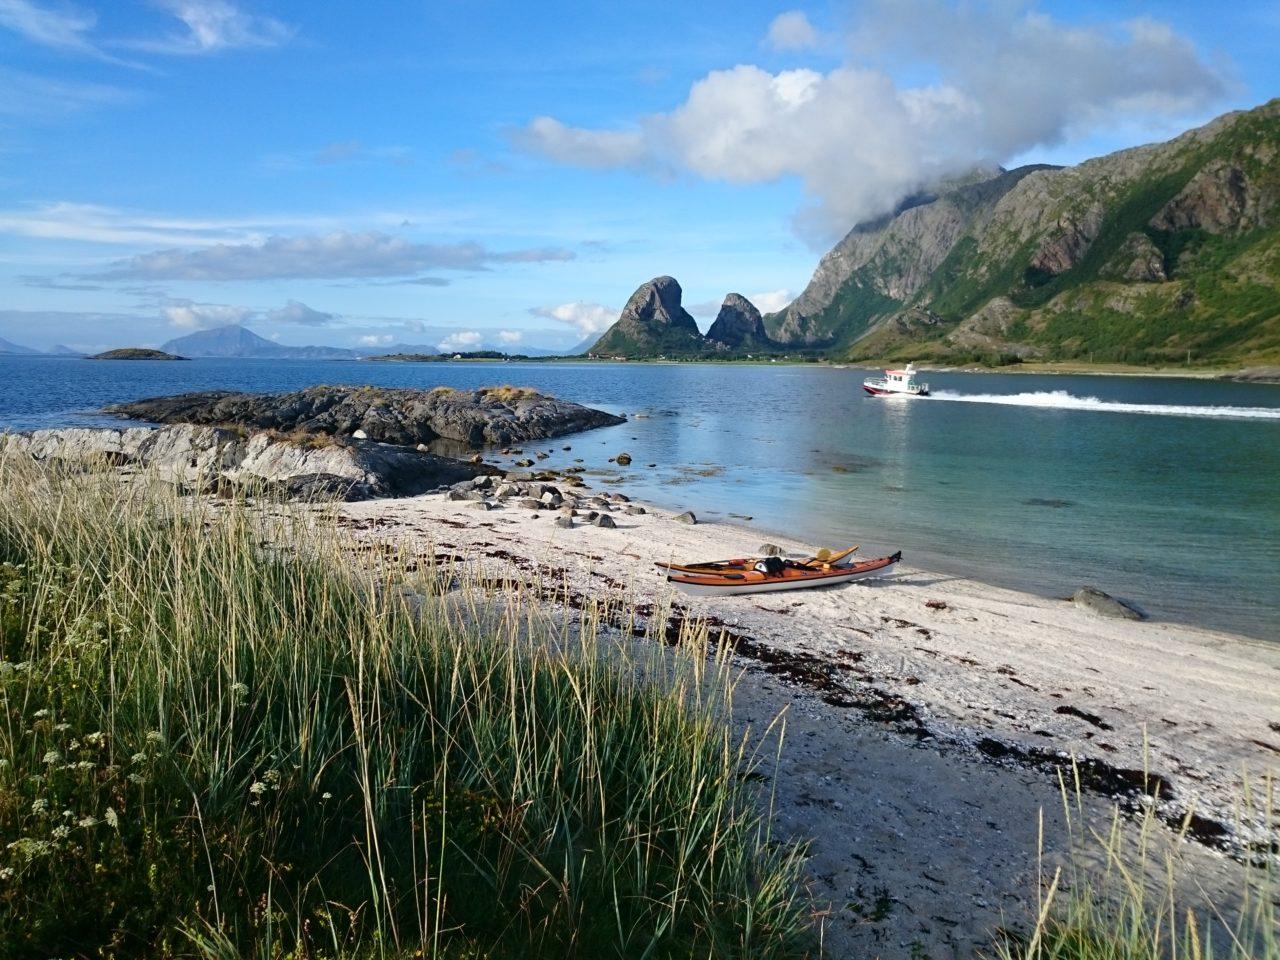 helgeland_sea_kayak_reiseliv_nesna